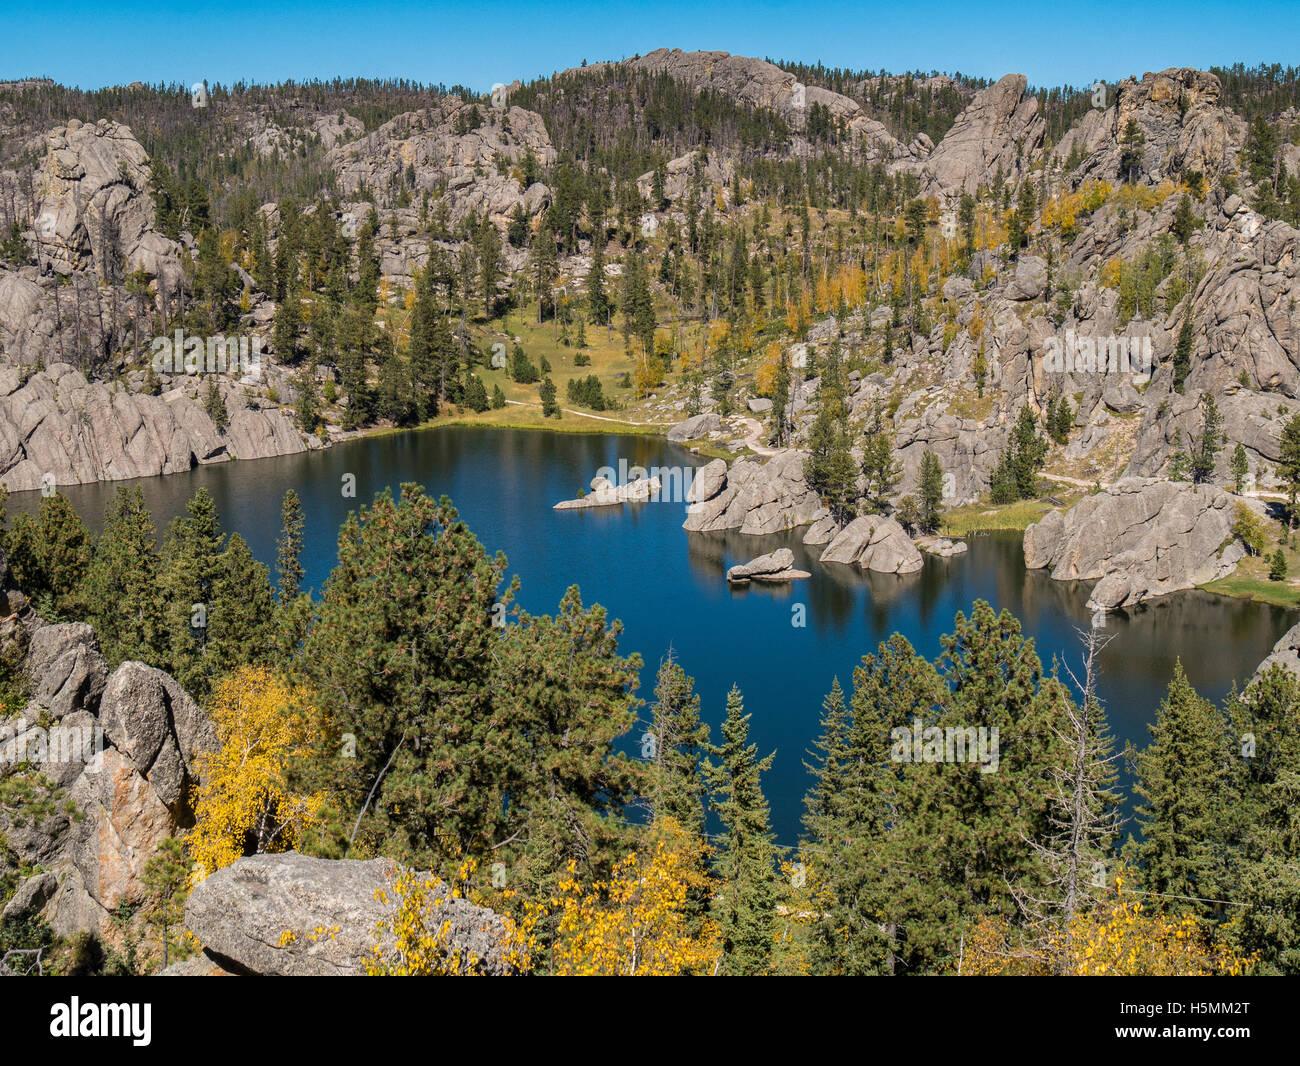 Sylvan Lake from the lodge, Custer State Park, Custer, South Dakota. - Stock Image